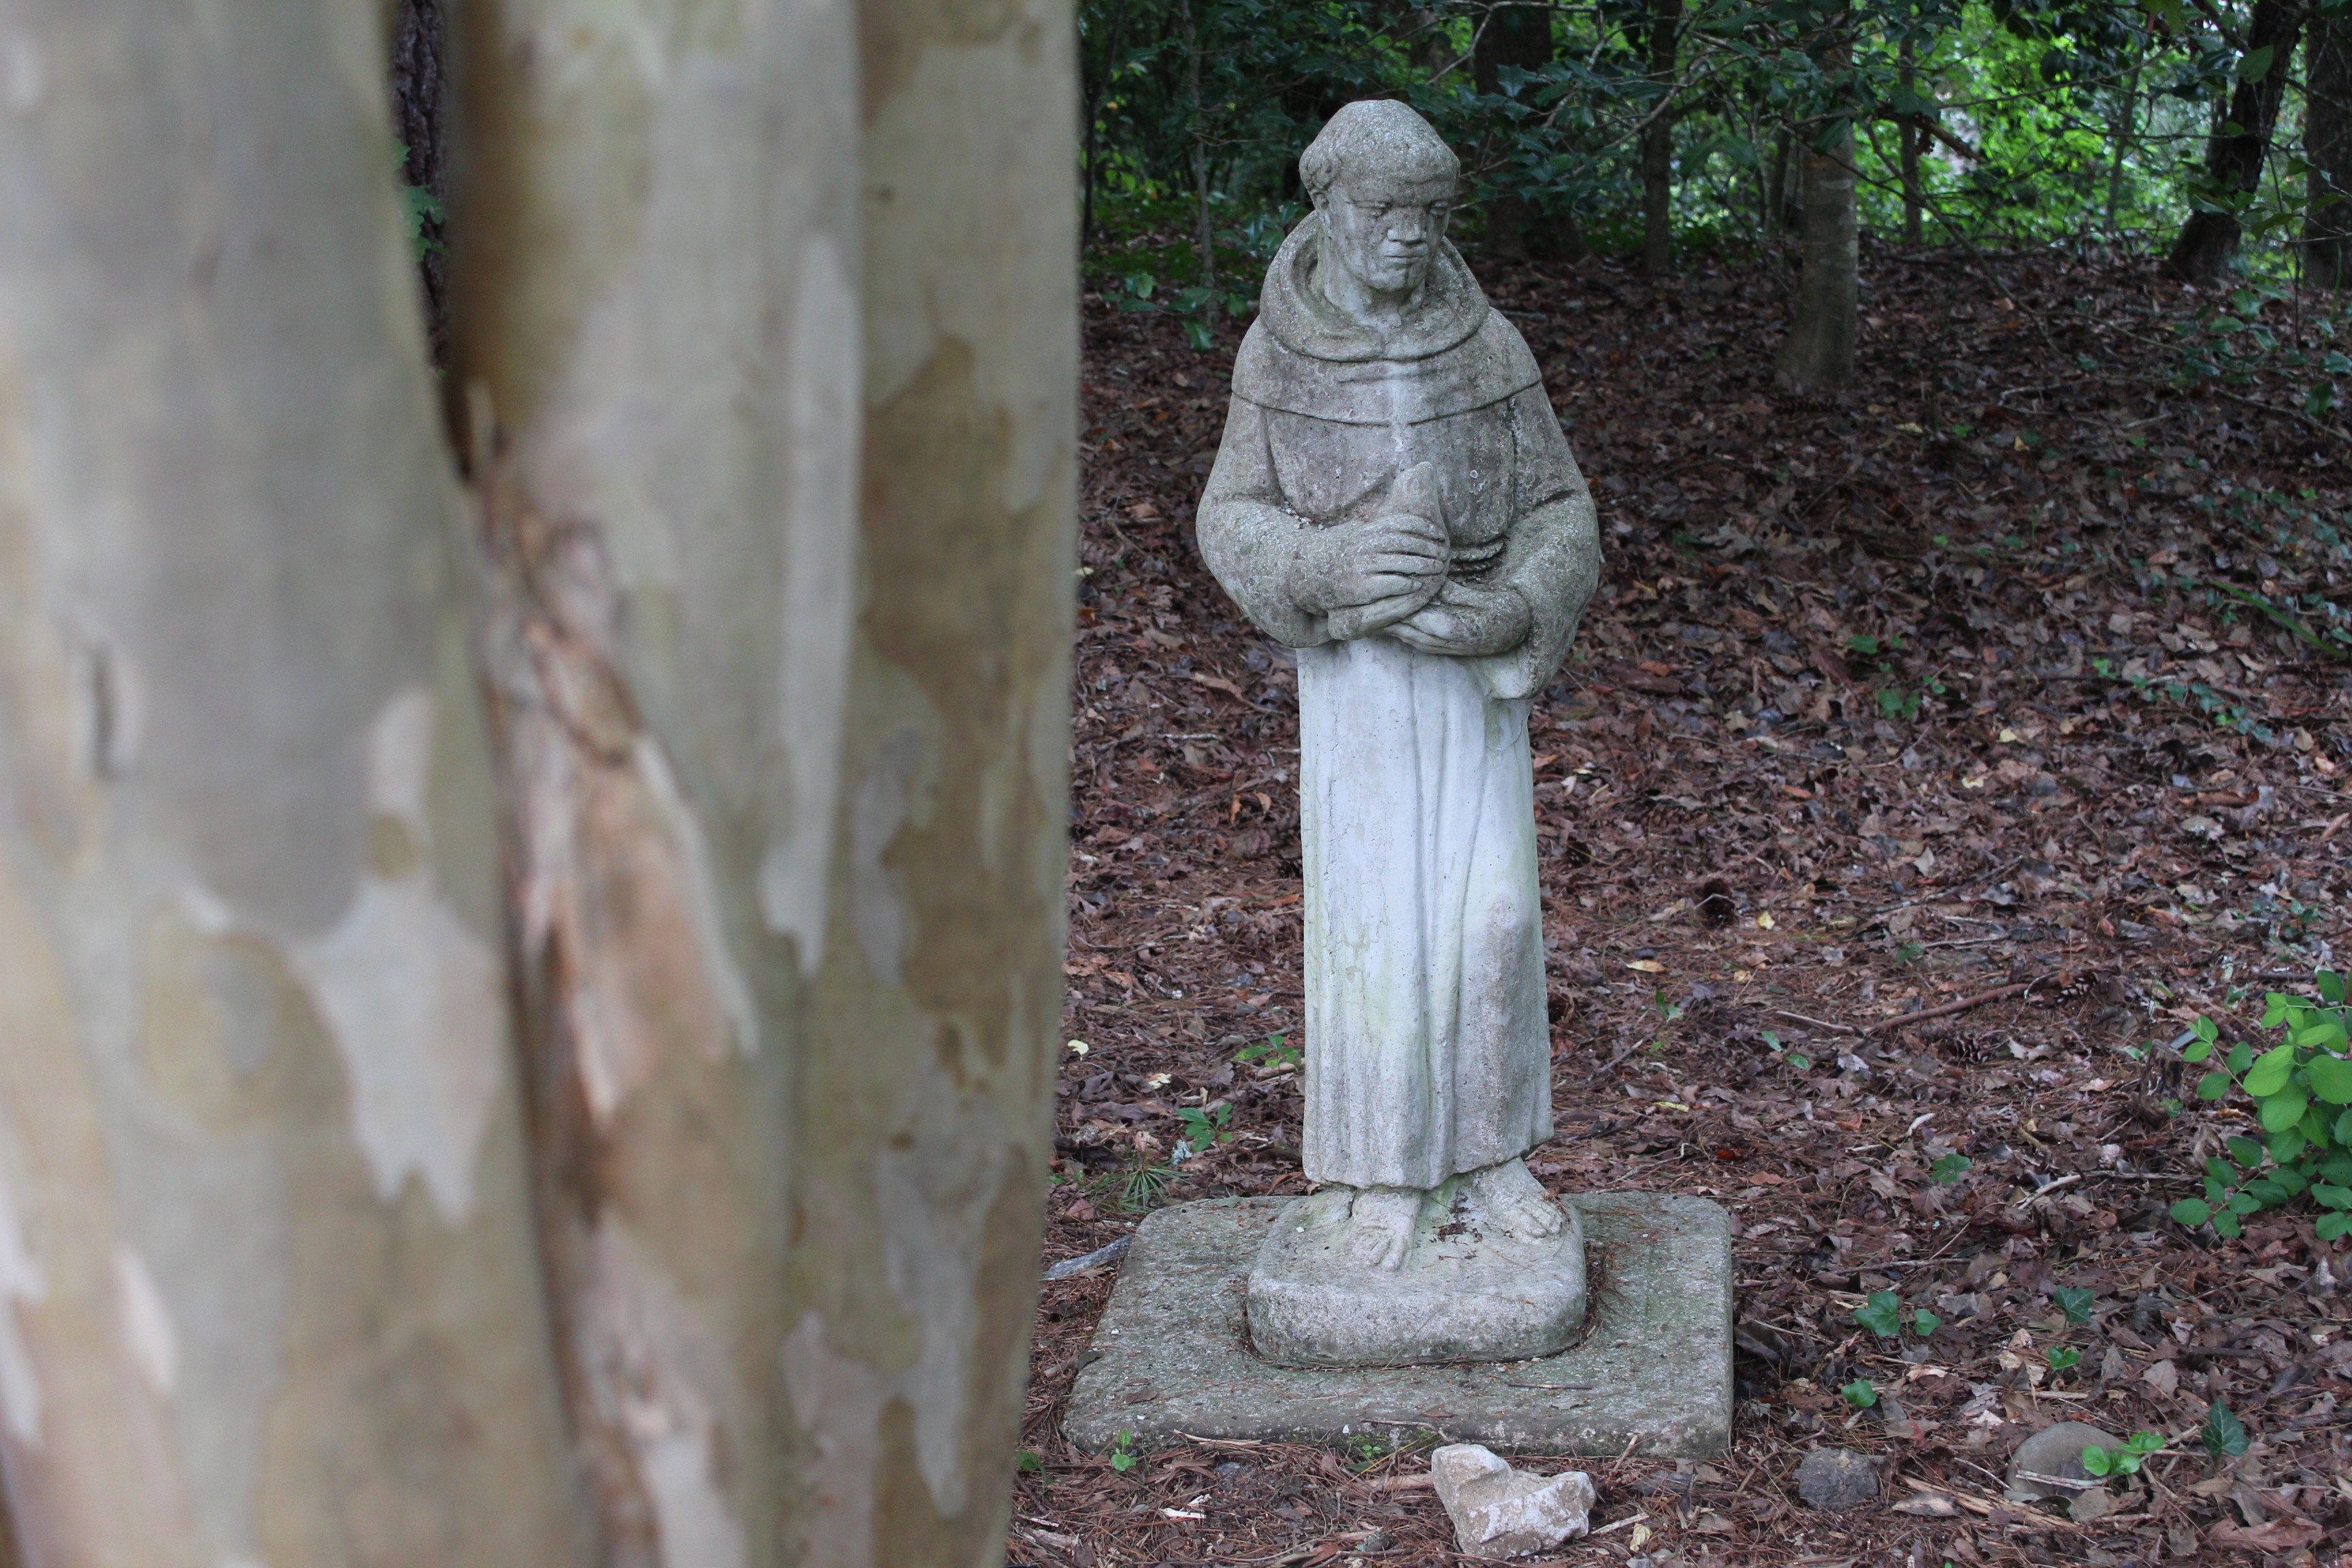 Statue in the shade garden.